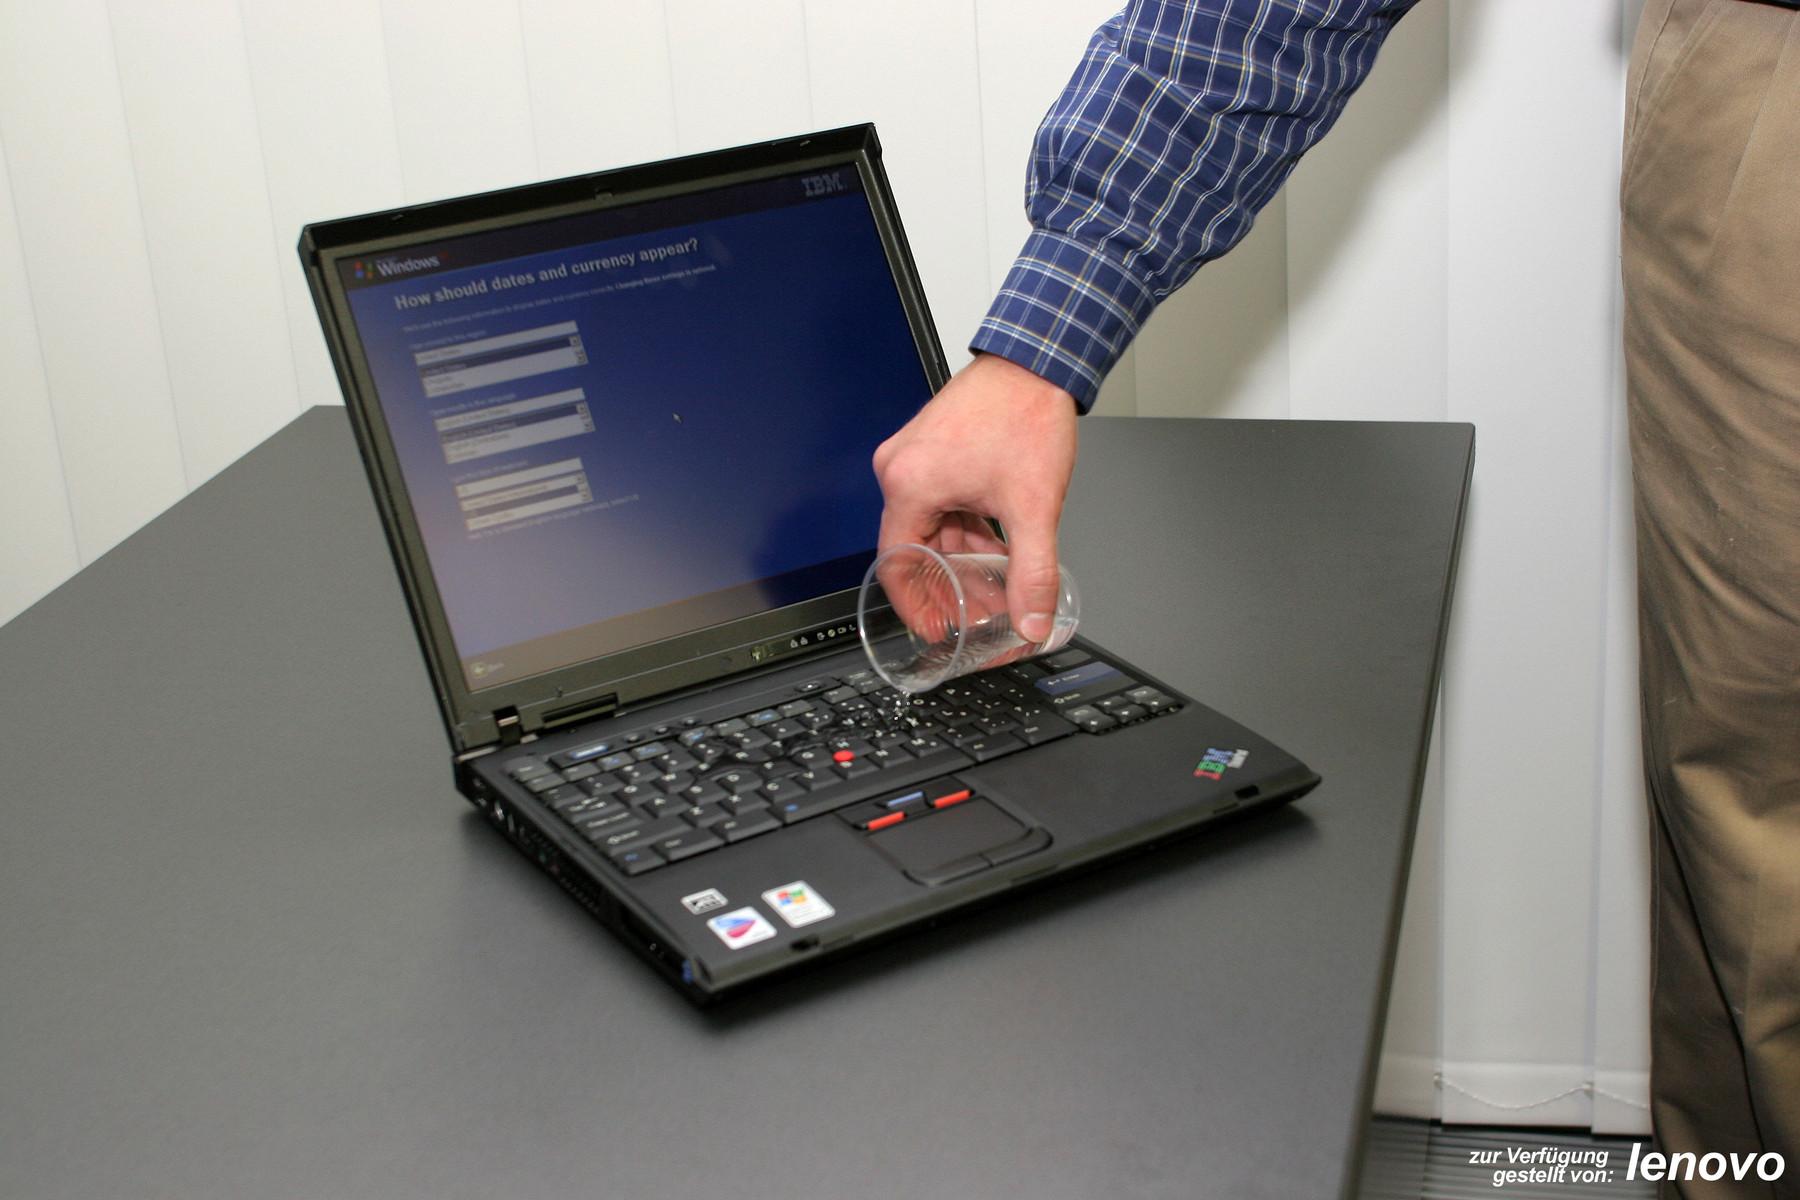 Review IBMLenovo Thinkpad T60  NotebookChecknet Reviews